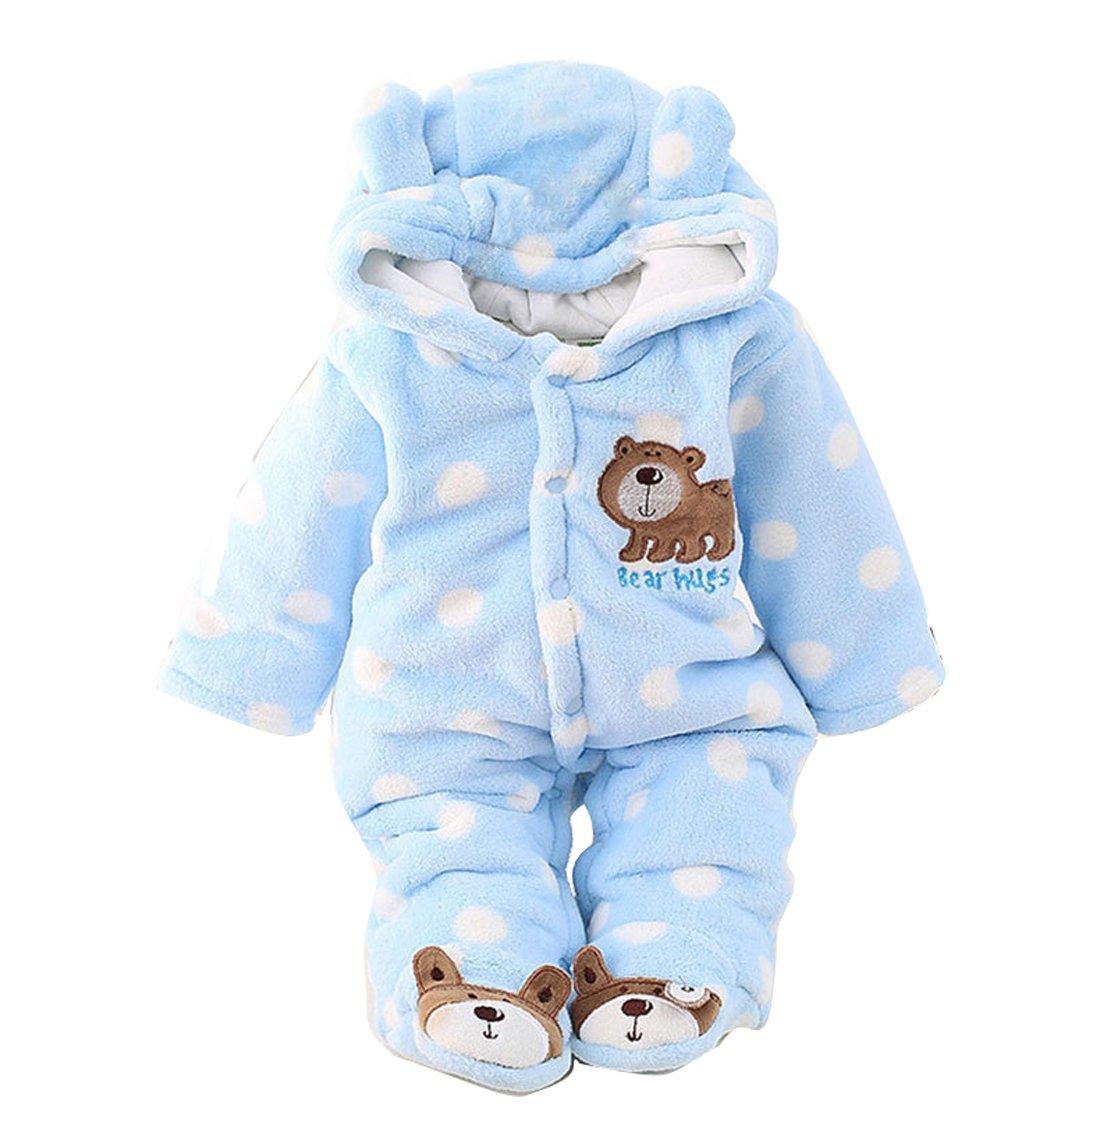 Gaorui Newborn Baby Jumpsuit Outfit Hoody Coat Winter Infant Rompers Toddler Clothing Bodysuit by Gaorui